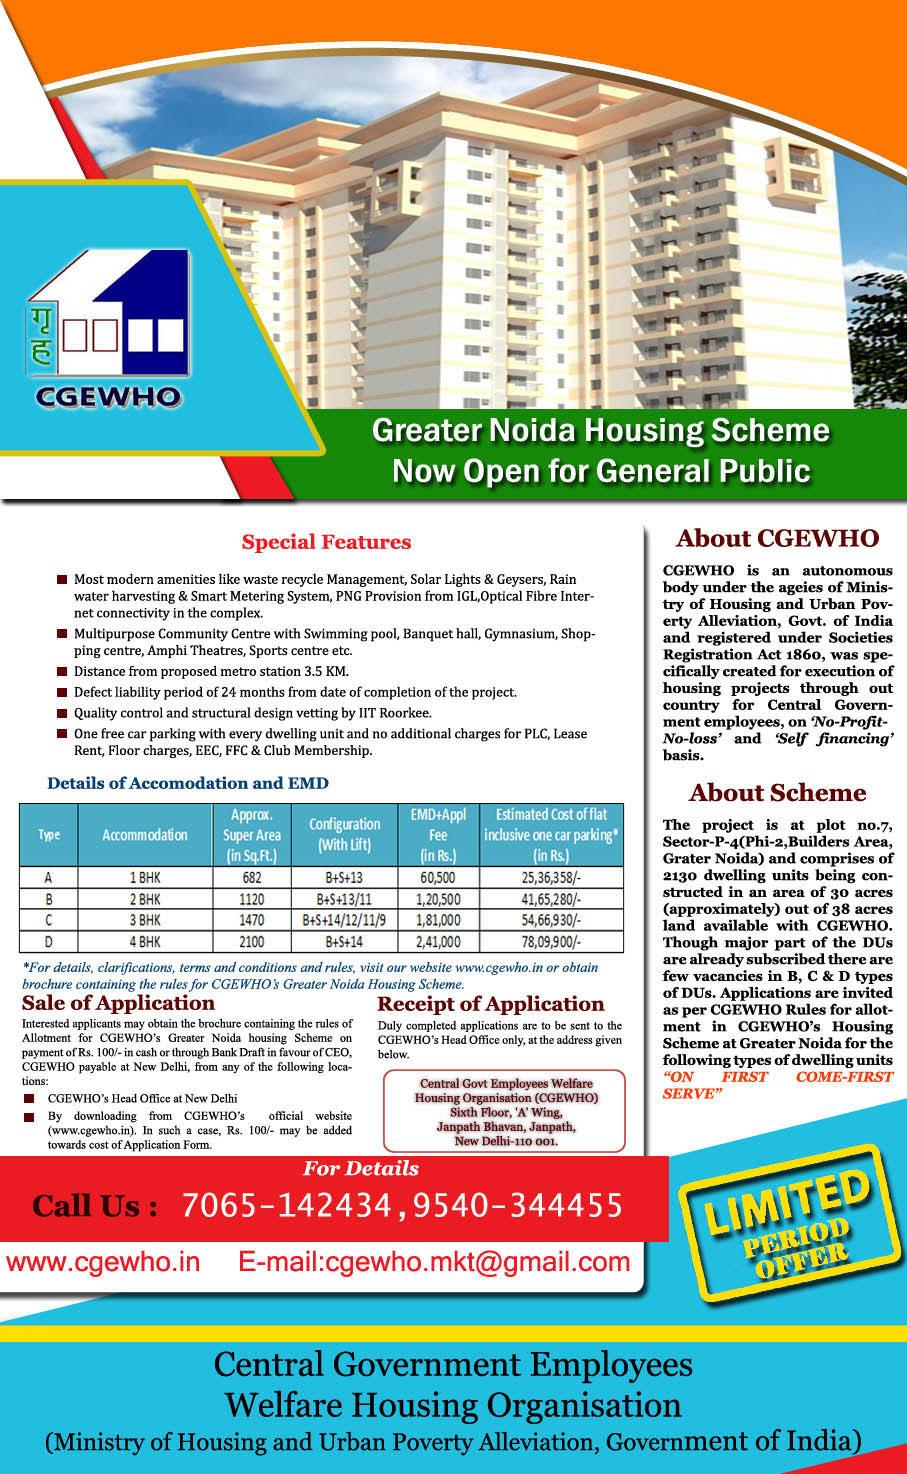 CGEWHO Greater Noida Housing Scheme 2016